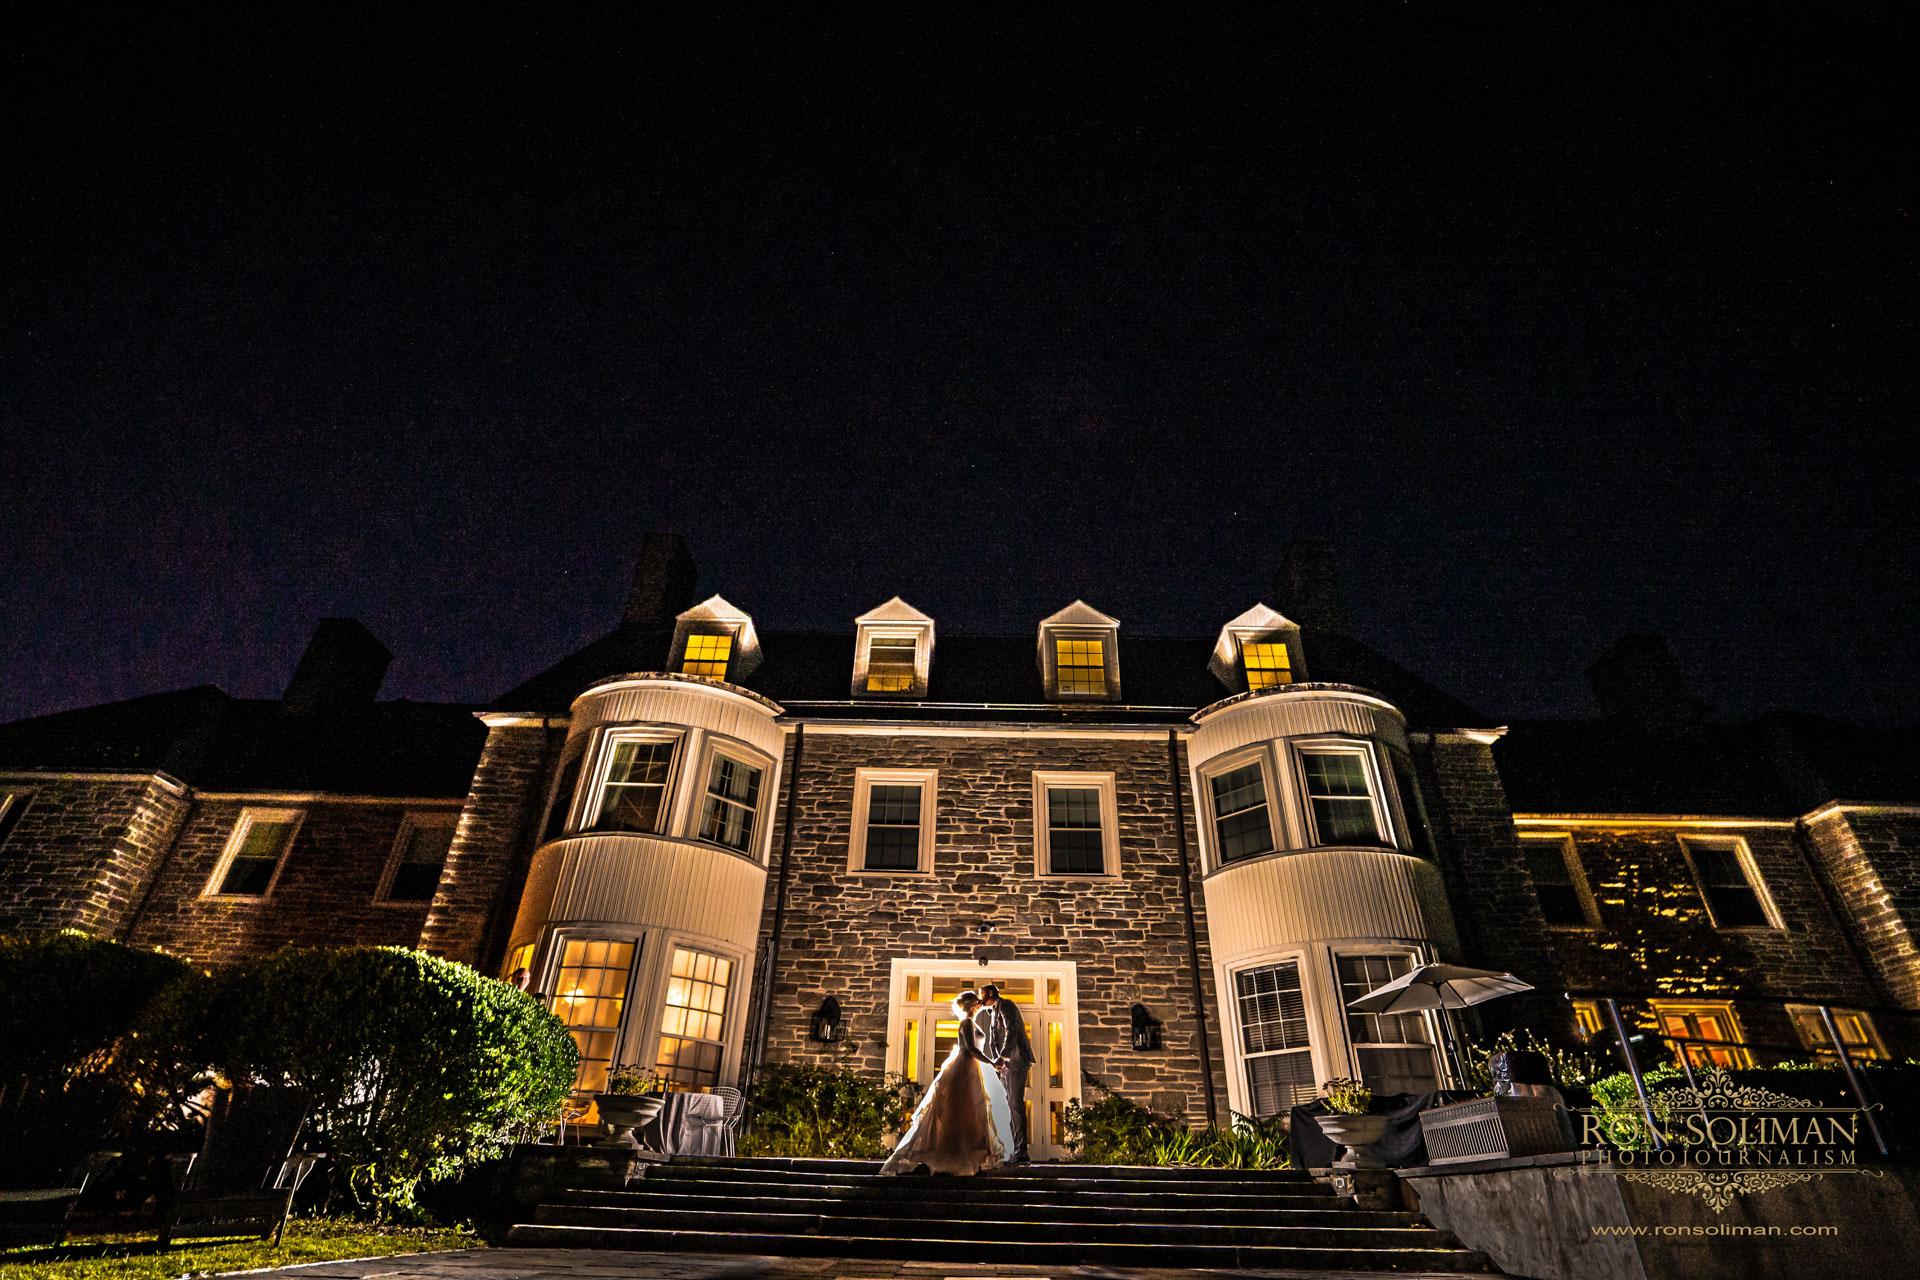 ALVERTHORPE MANOR HOUSE WEDDING 26